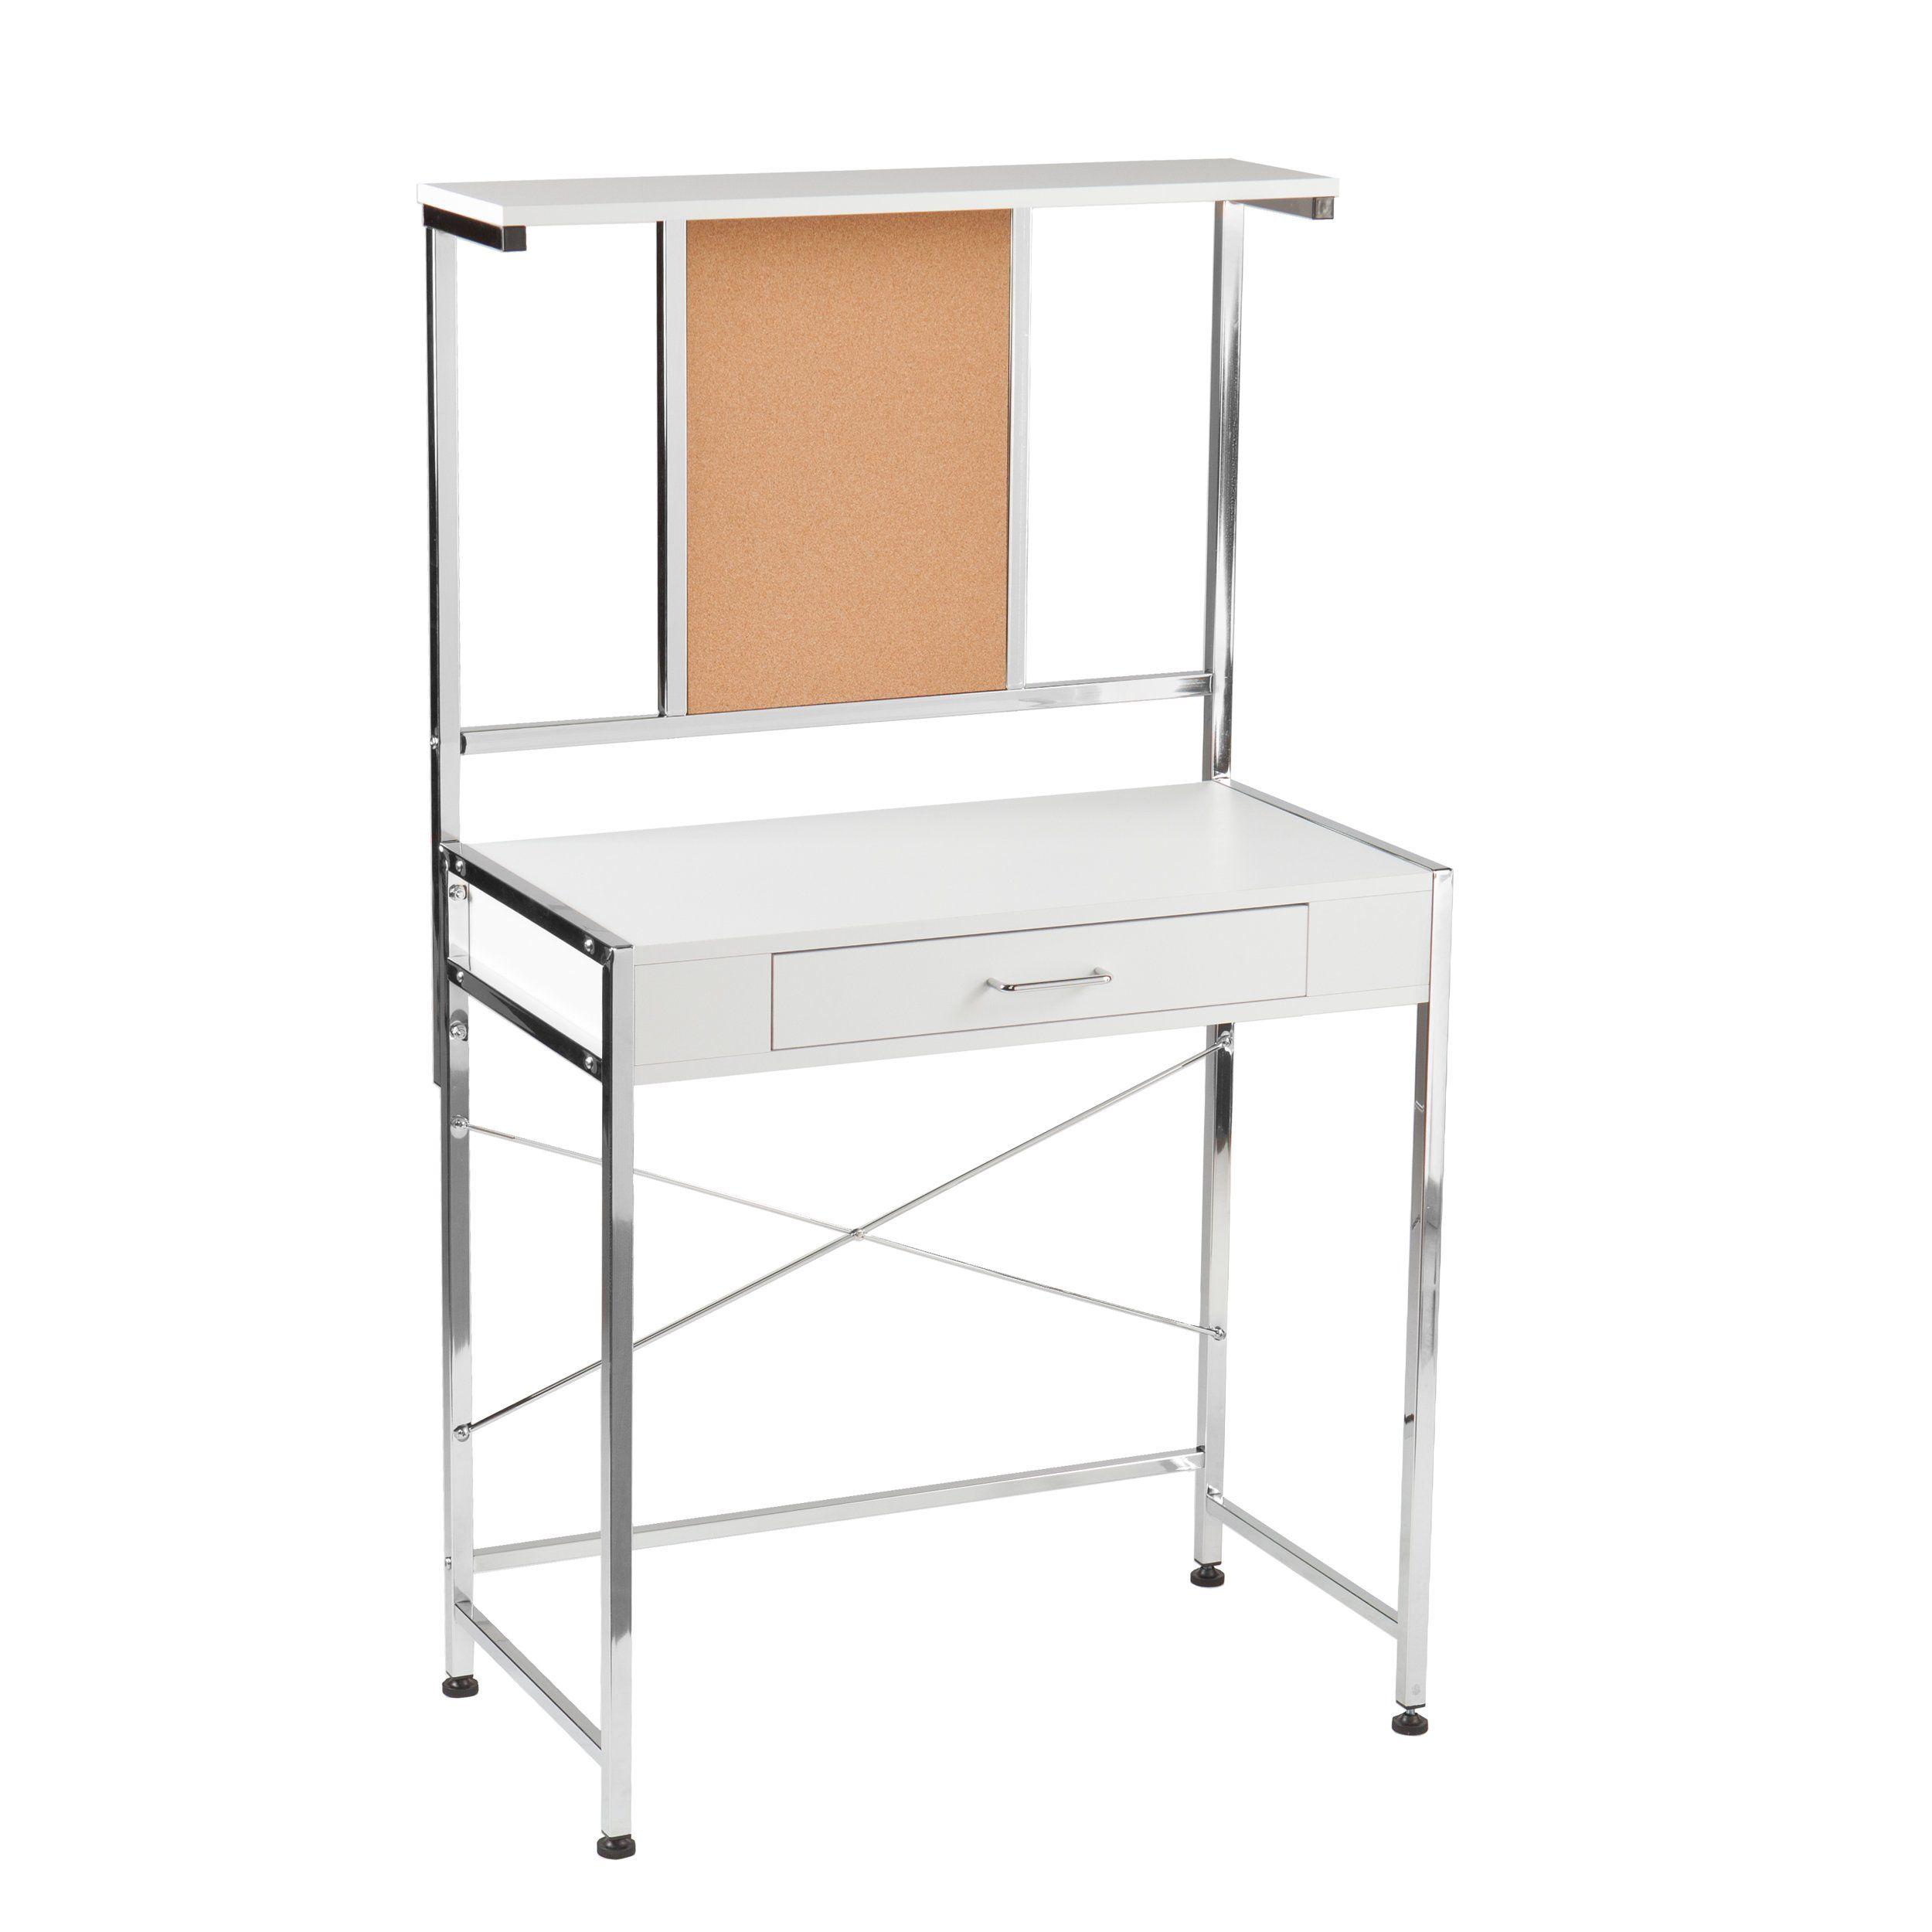 Southern Enterprises Banfield Multifunction Desk, White